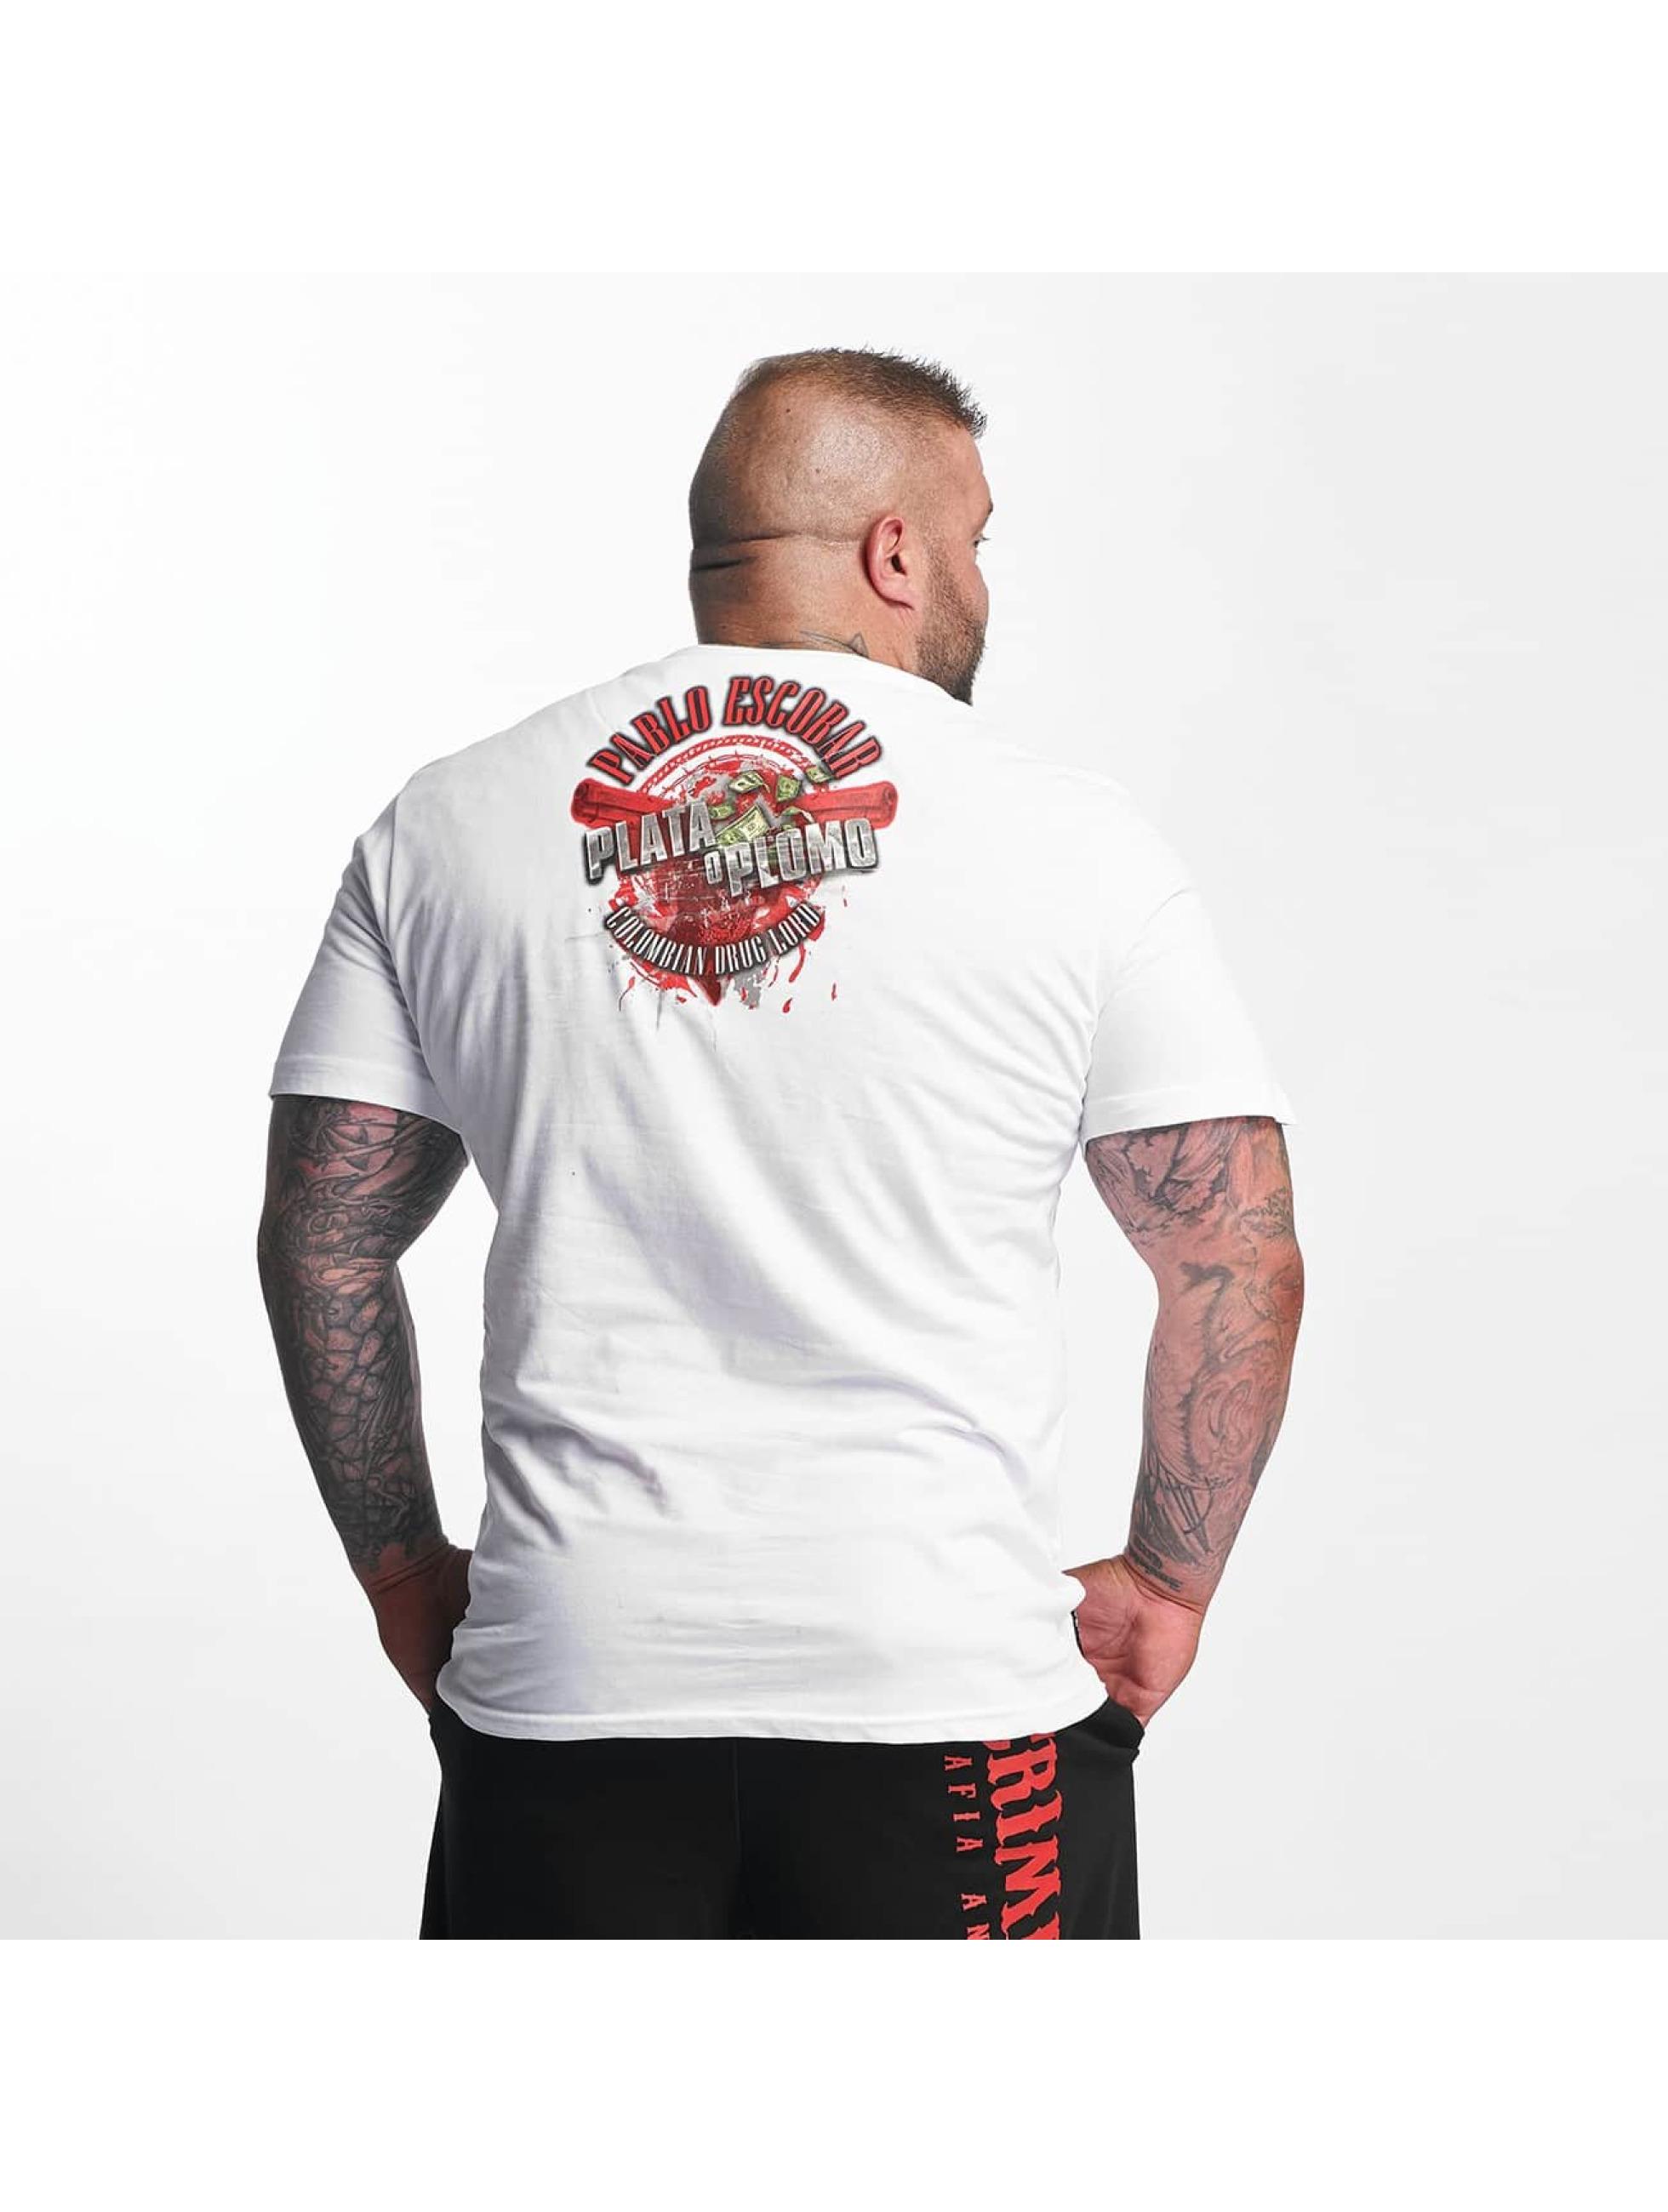 Mafia & Crime Camiseta Plata o Plomo blanco